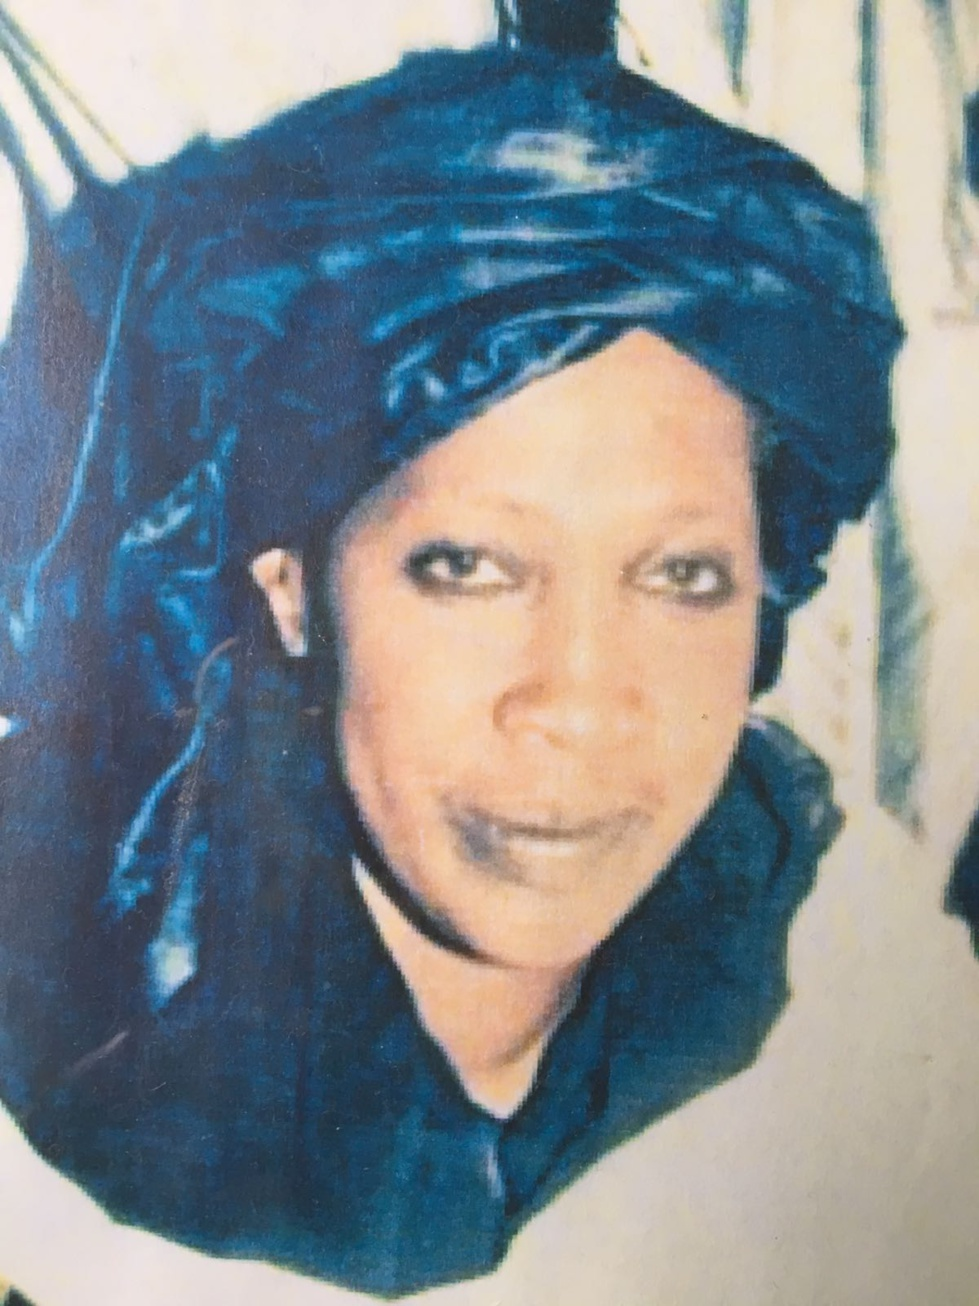 Aimable mère Adja Aminata Fall Yaye Birahim Coumba Cherif, repose en paix